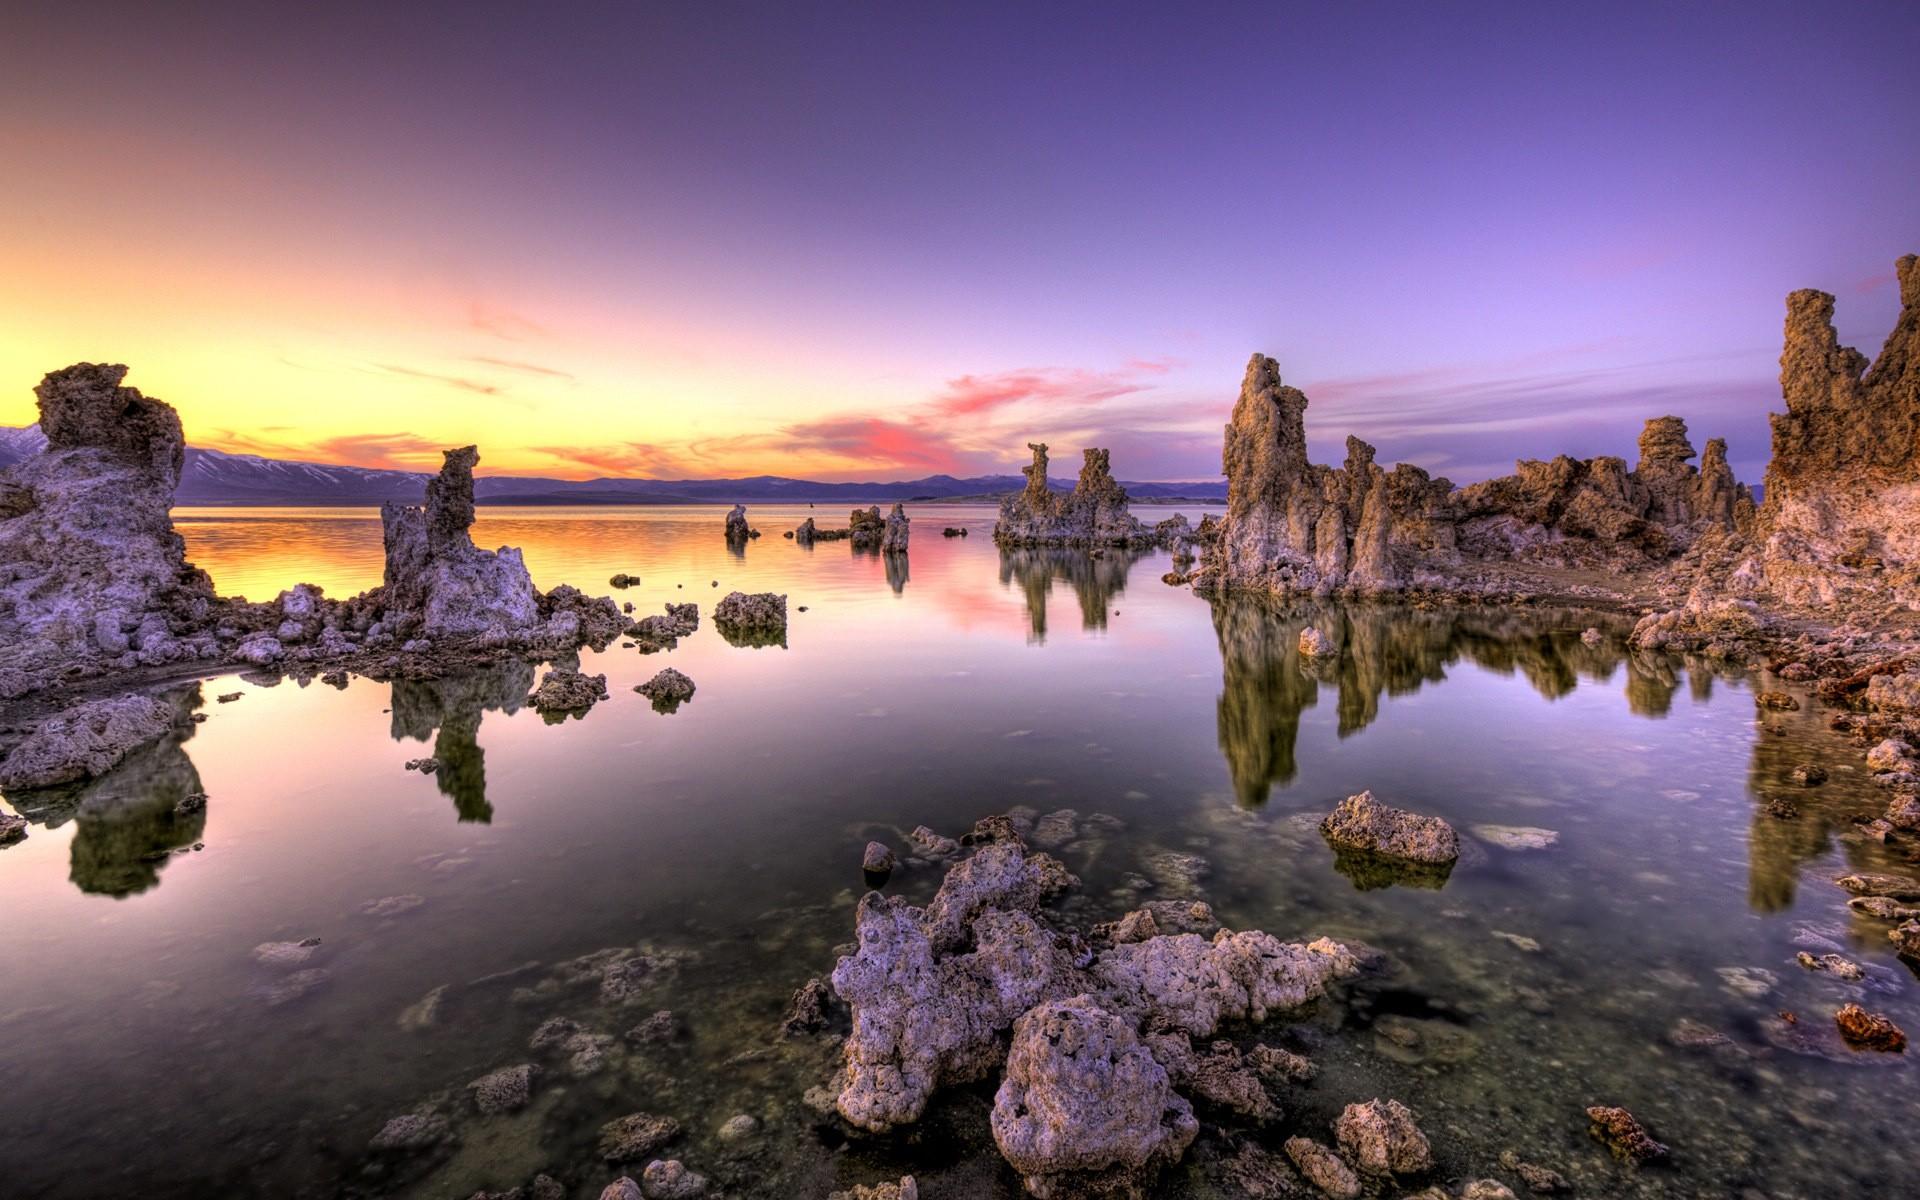 Landscape 4K Ultra HD Wallpaper | nature lake sunset landscape ultrahd 4k  wallpaper wallpaper background